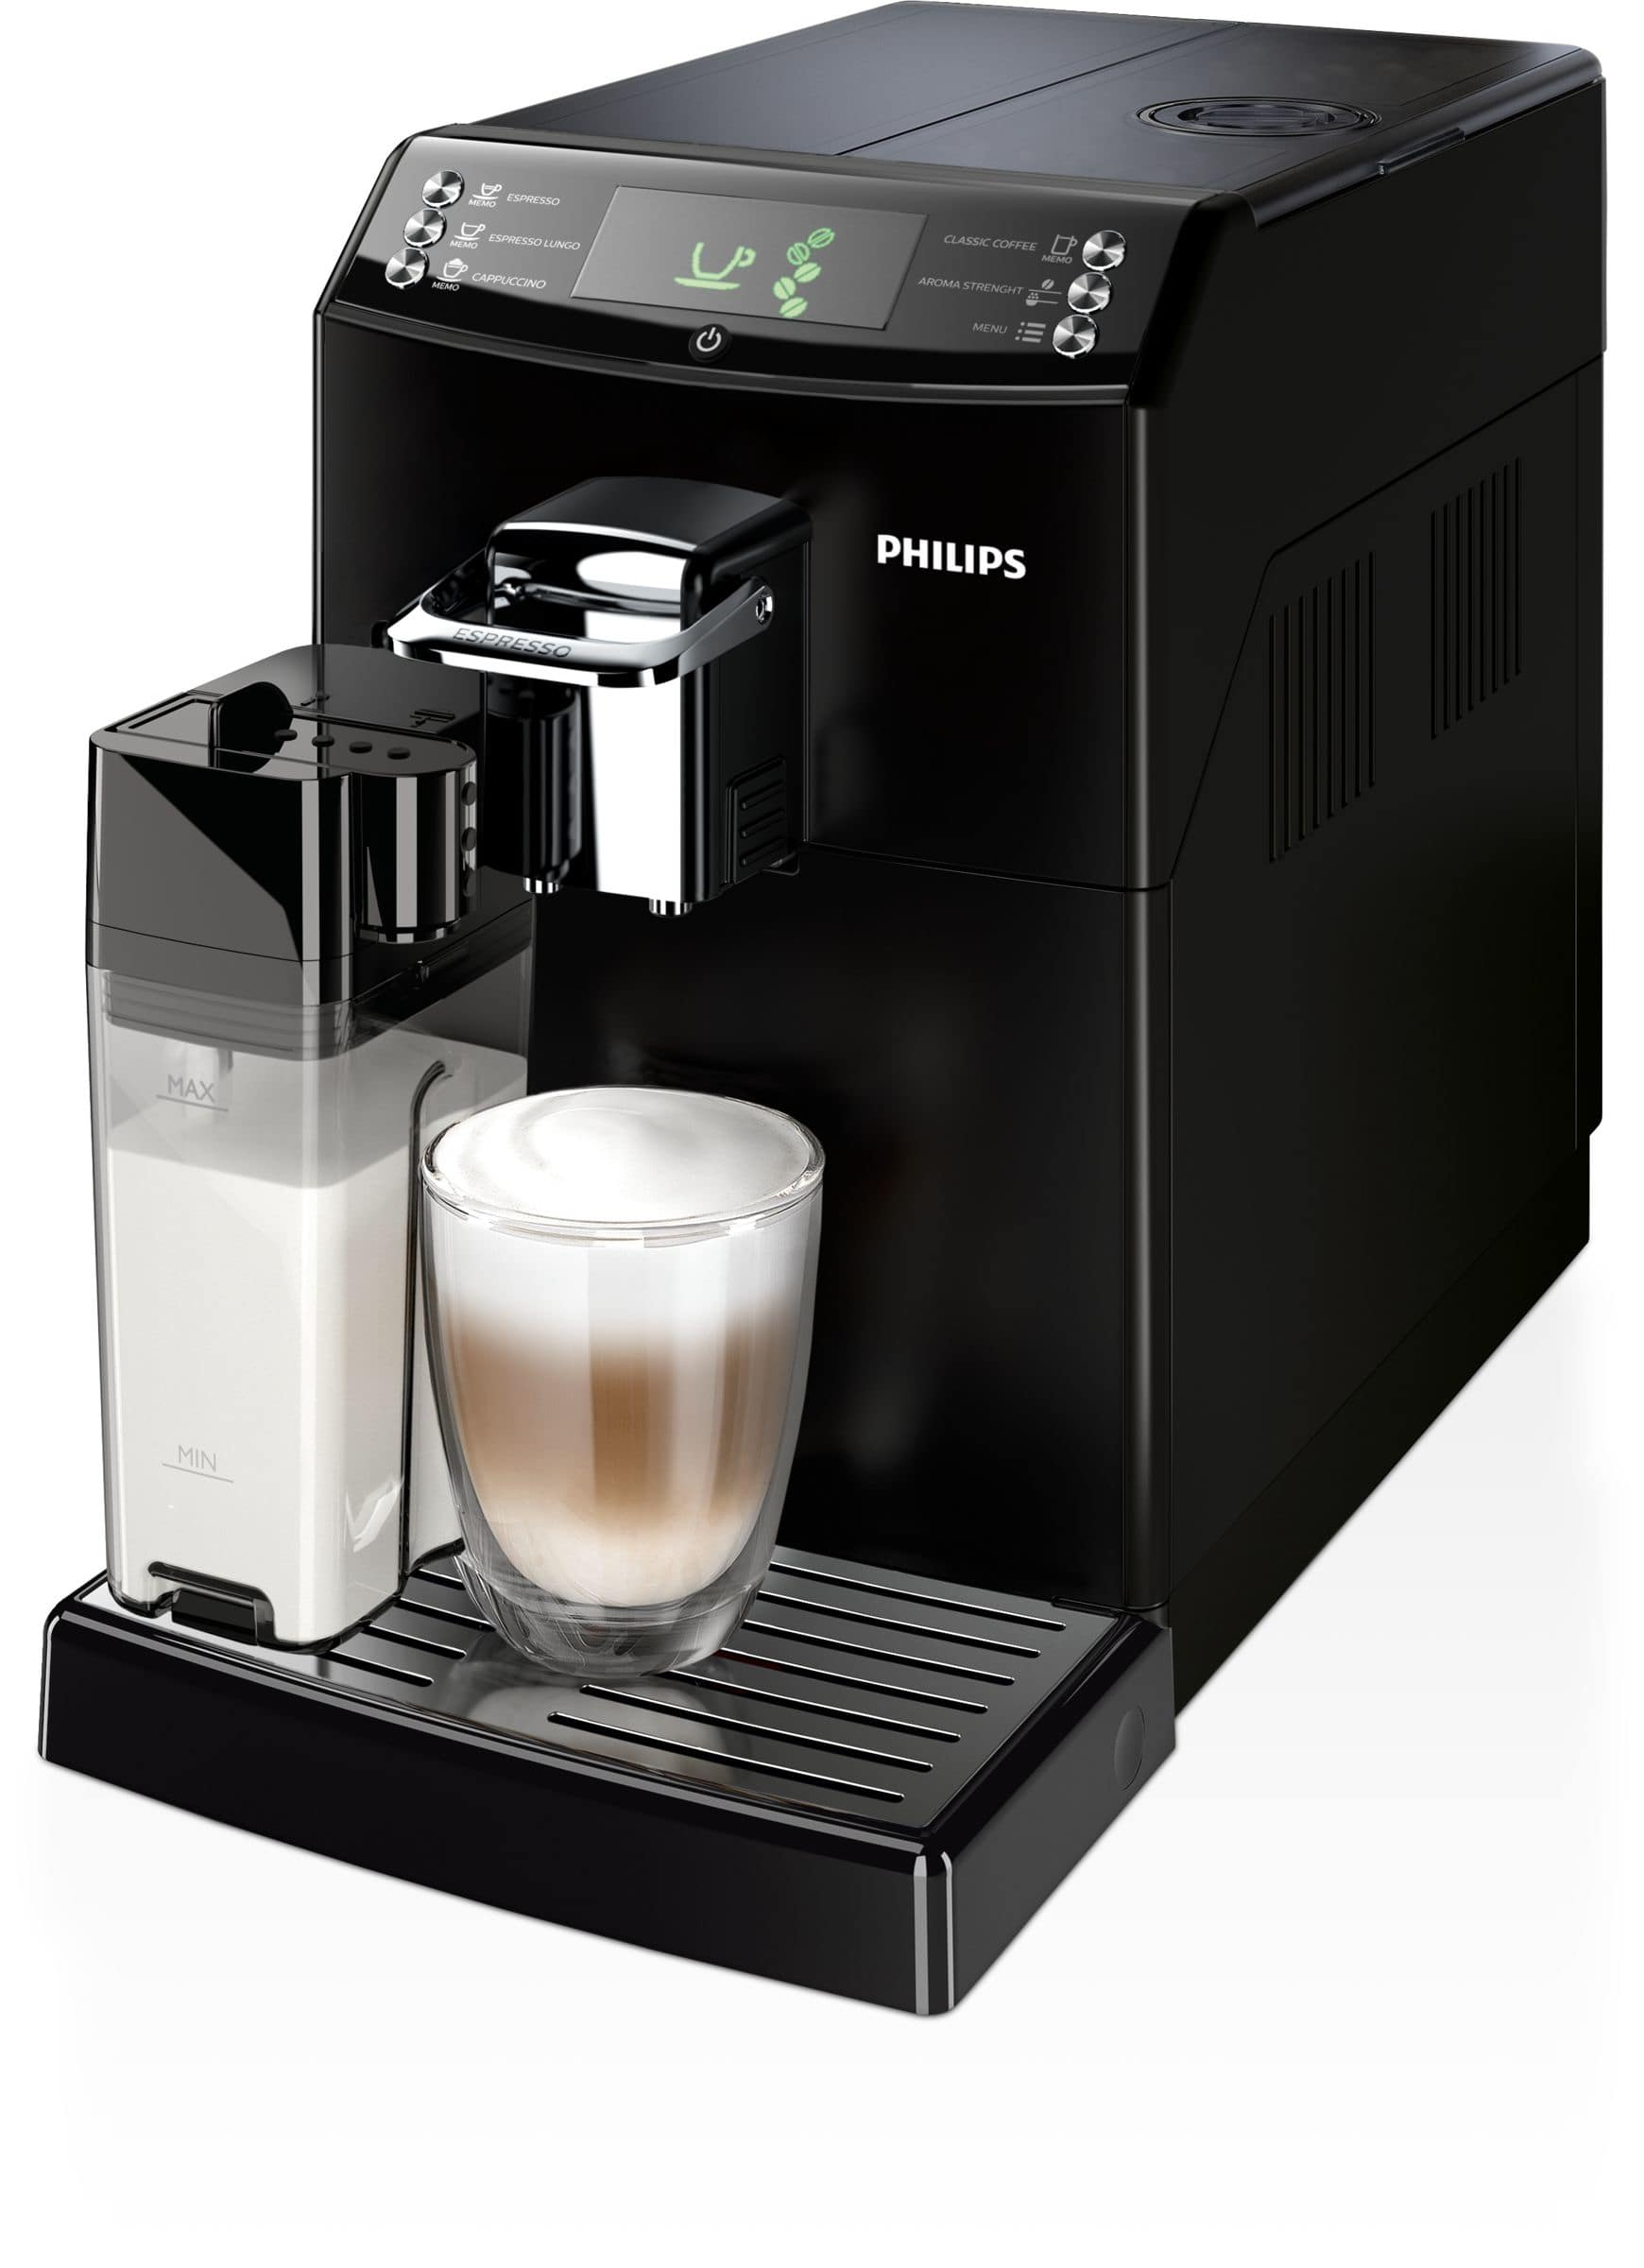 Philips HD 8847/01 4000 Serie Kaffeevollautomat 15bar 1,8l 250g für 569,00 Euro